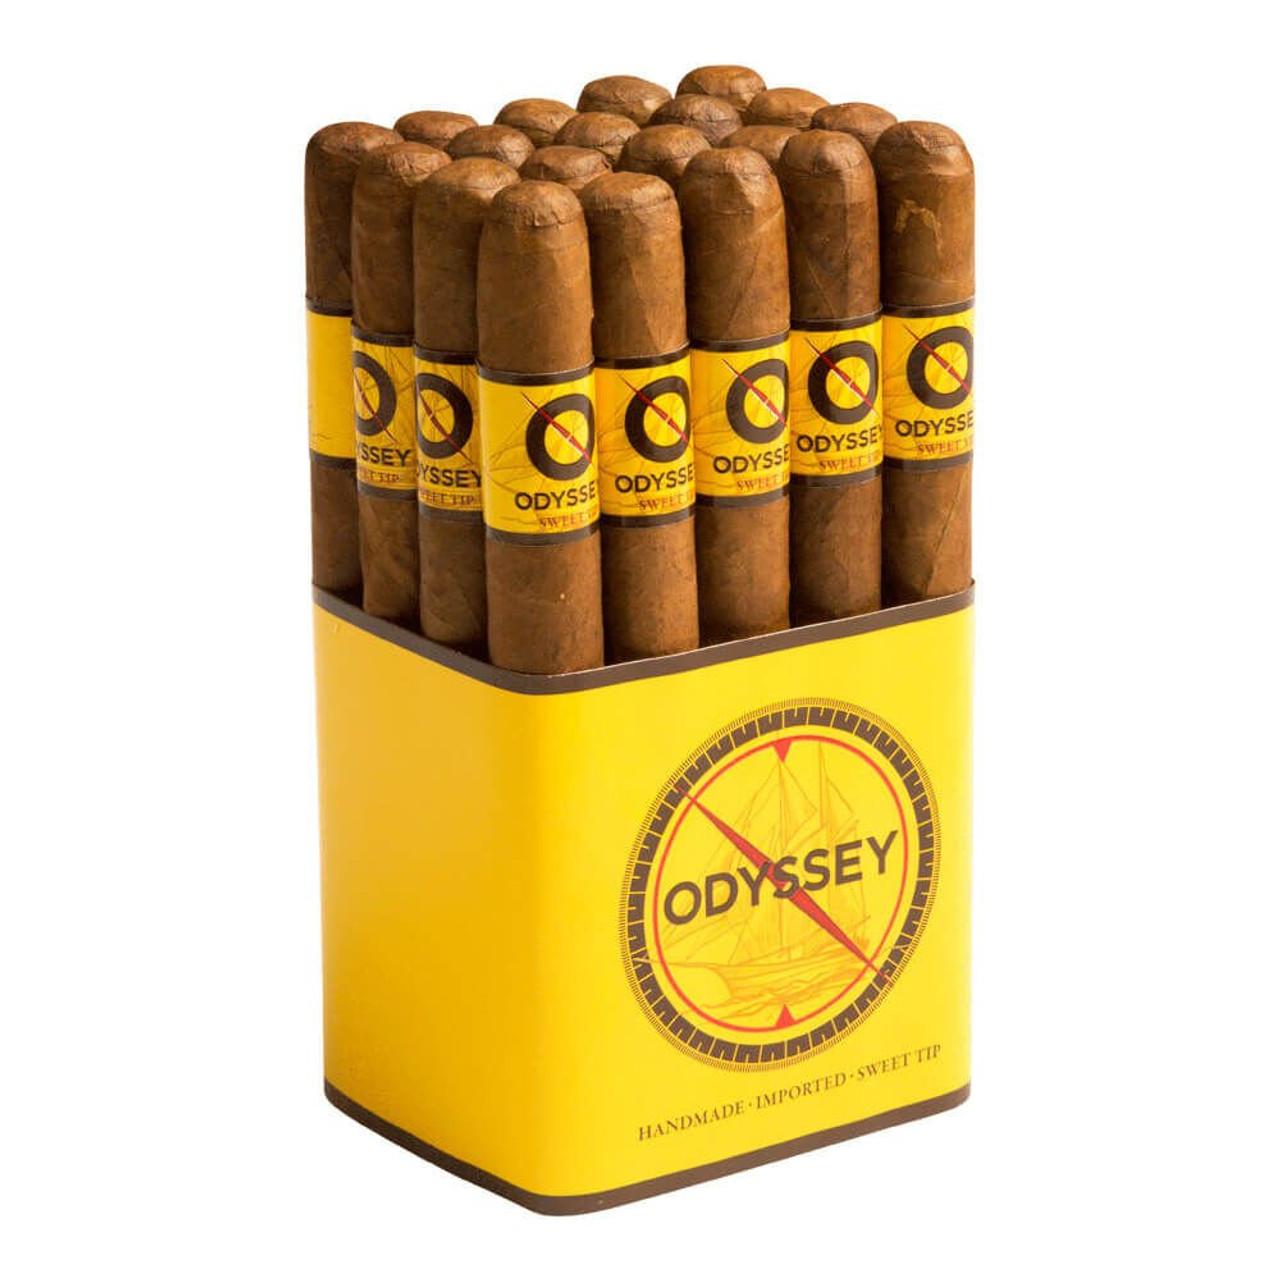 Odyssey Sweet Tip Robusto Cigars - 5 x 50 (Bundle of 20)